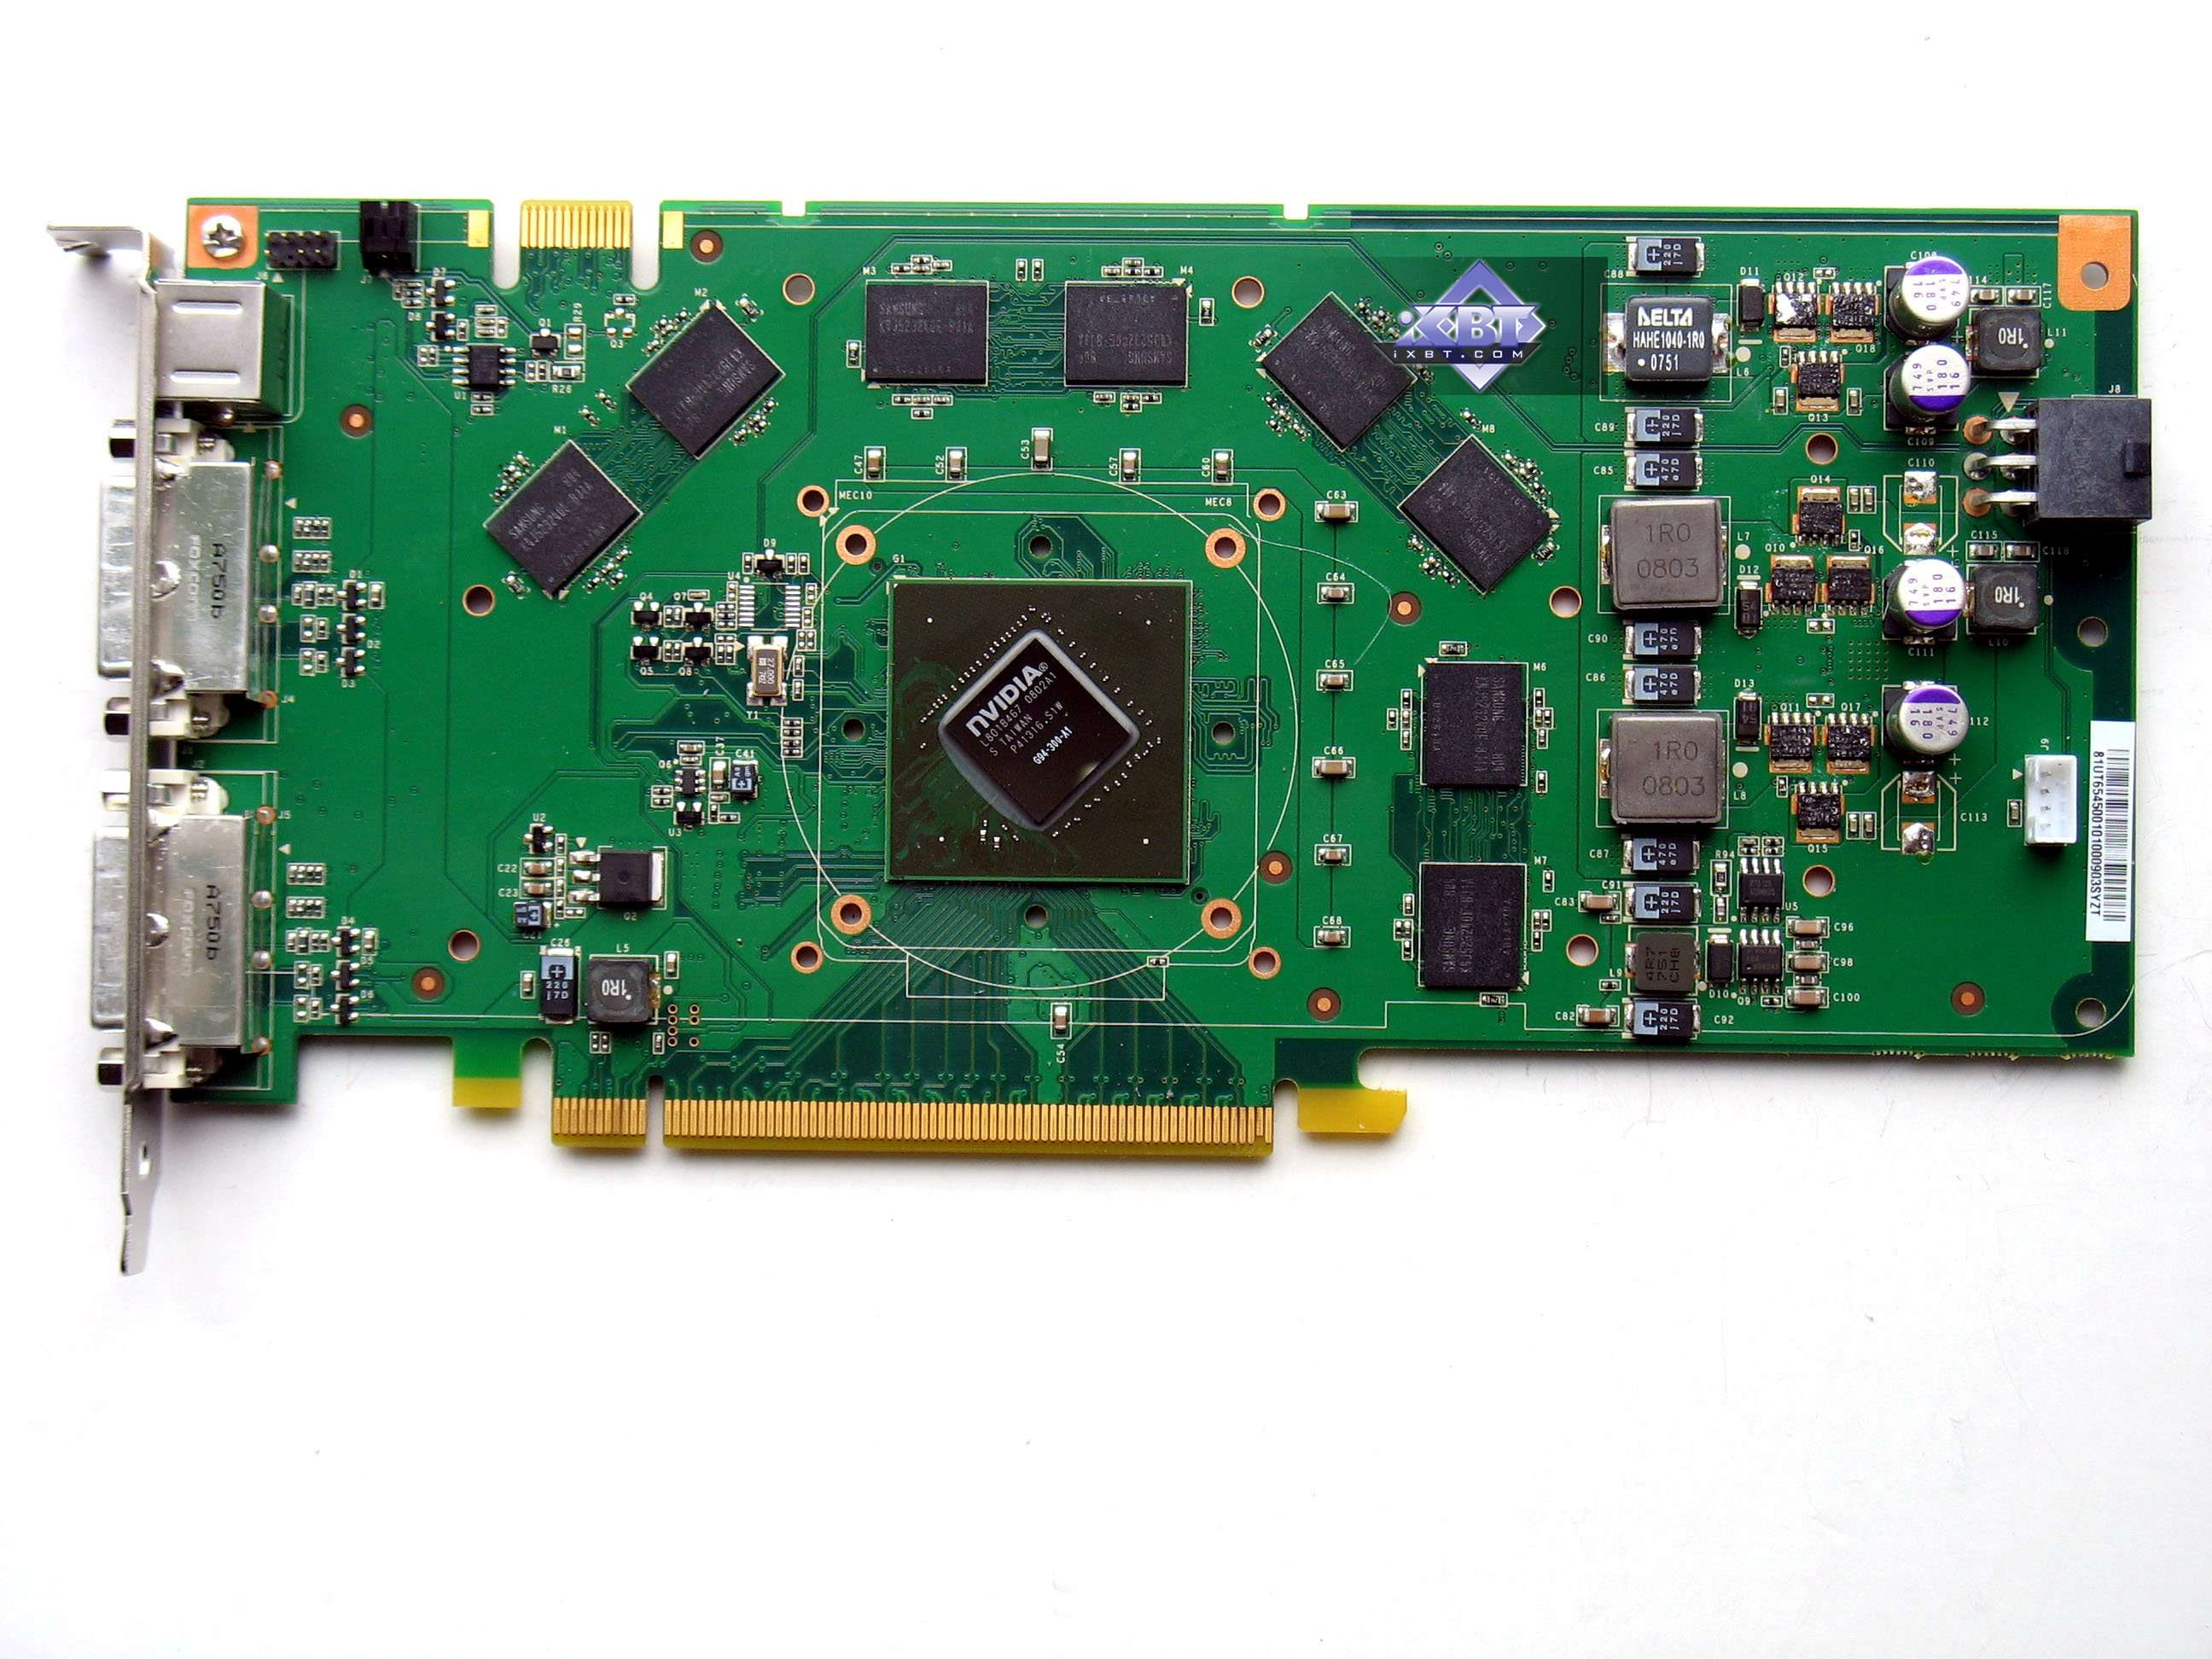 Nvidia 9600 gt driver windows 7.